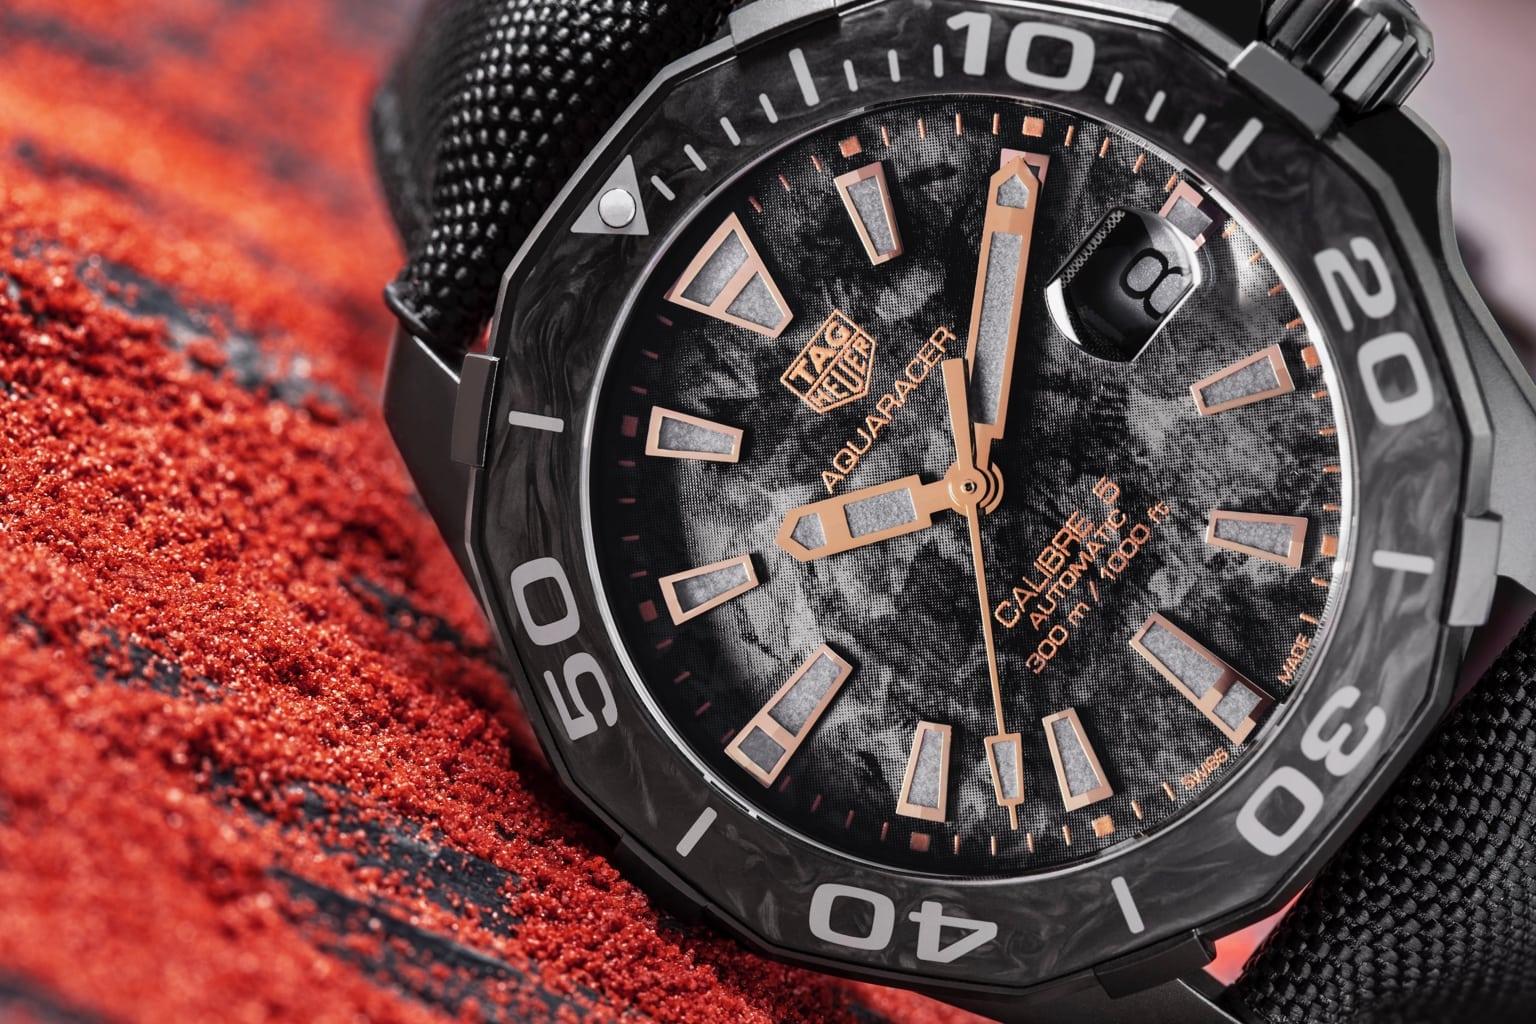 đồng hồ TAG-Heuer-Aquaracer-Carbon